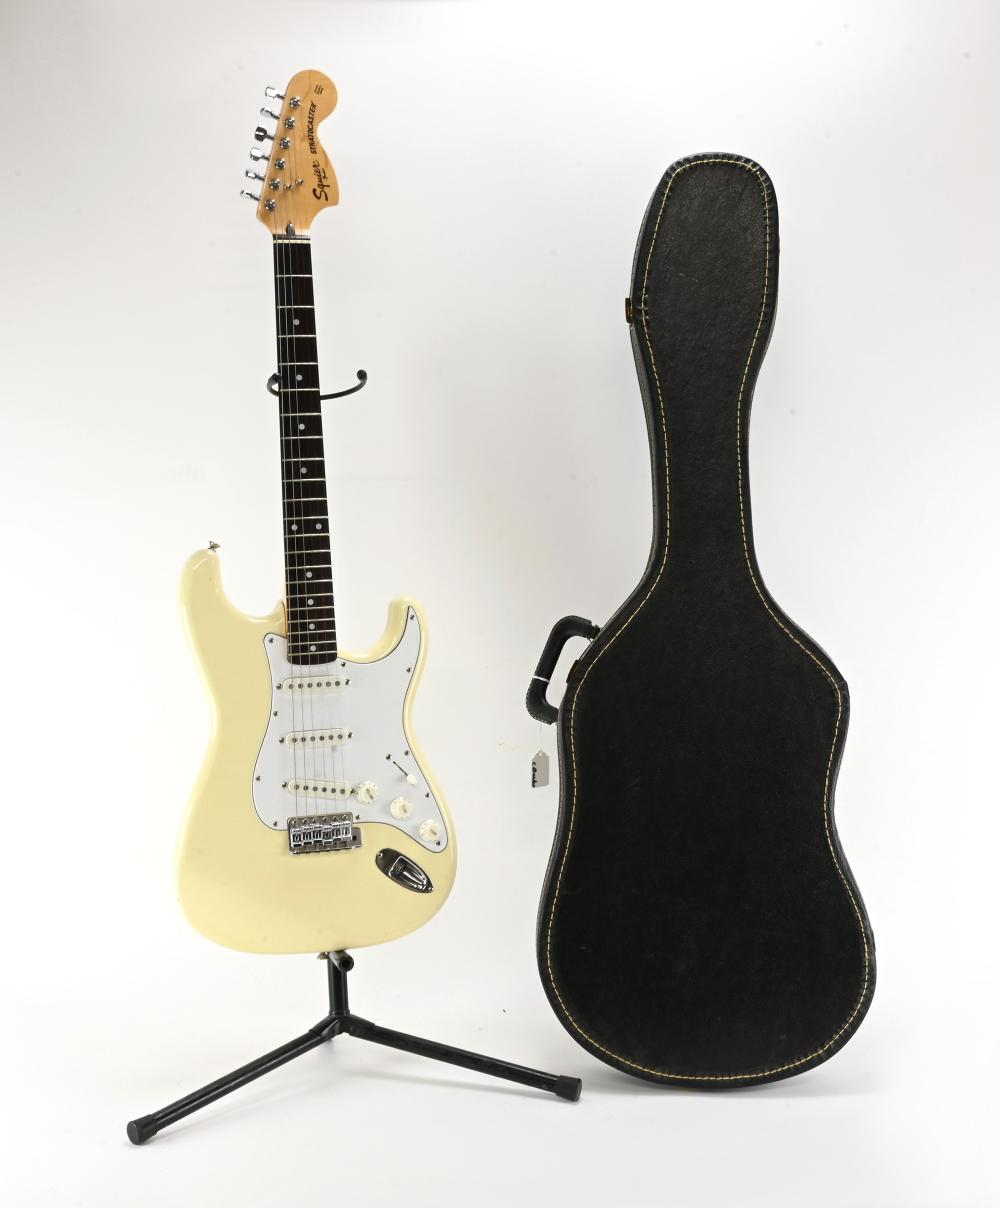 Vintage Fender Squier Stratocaster Guitar